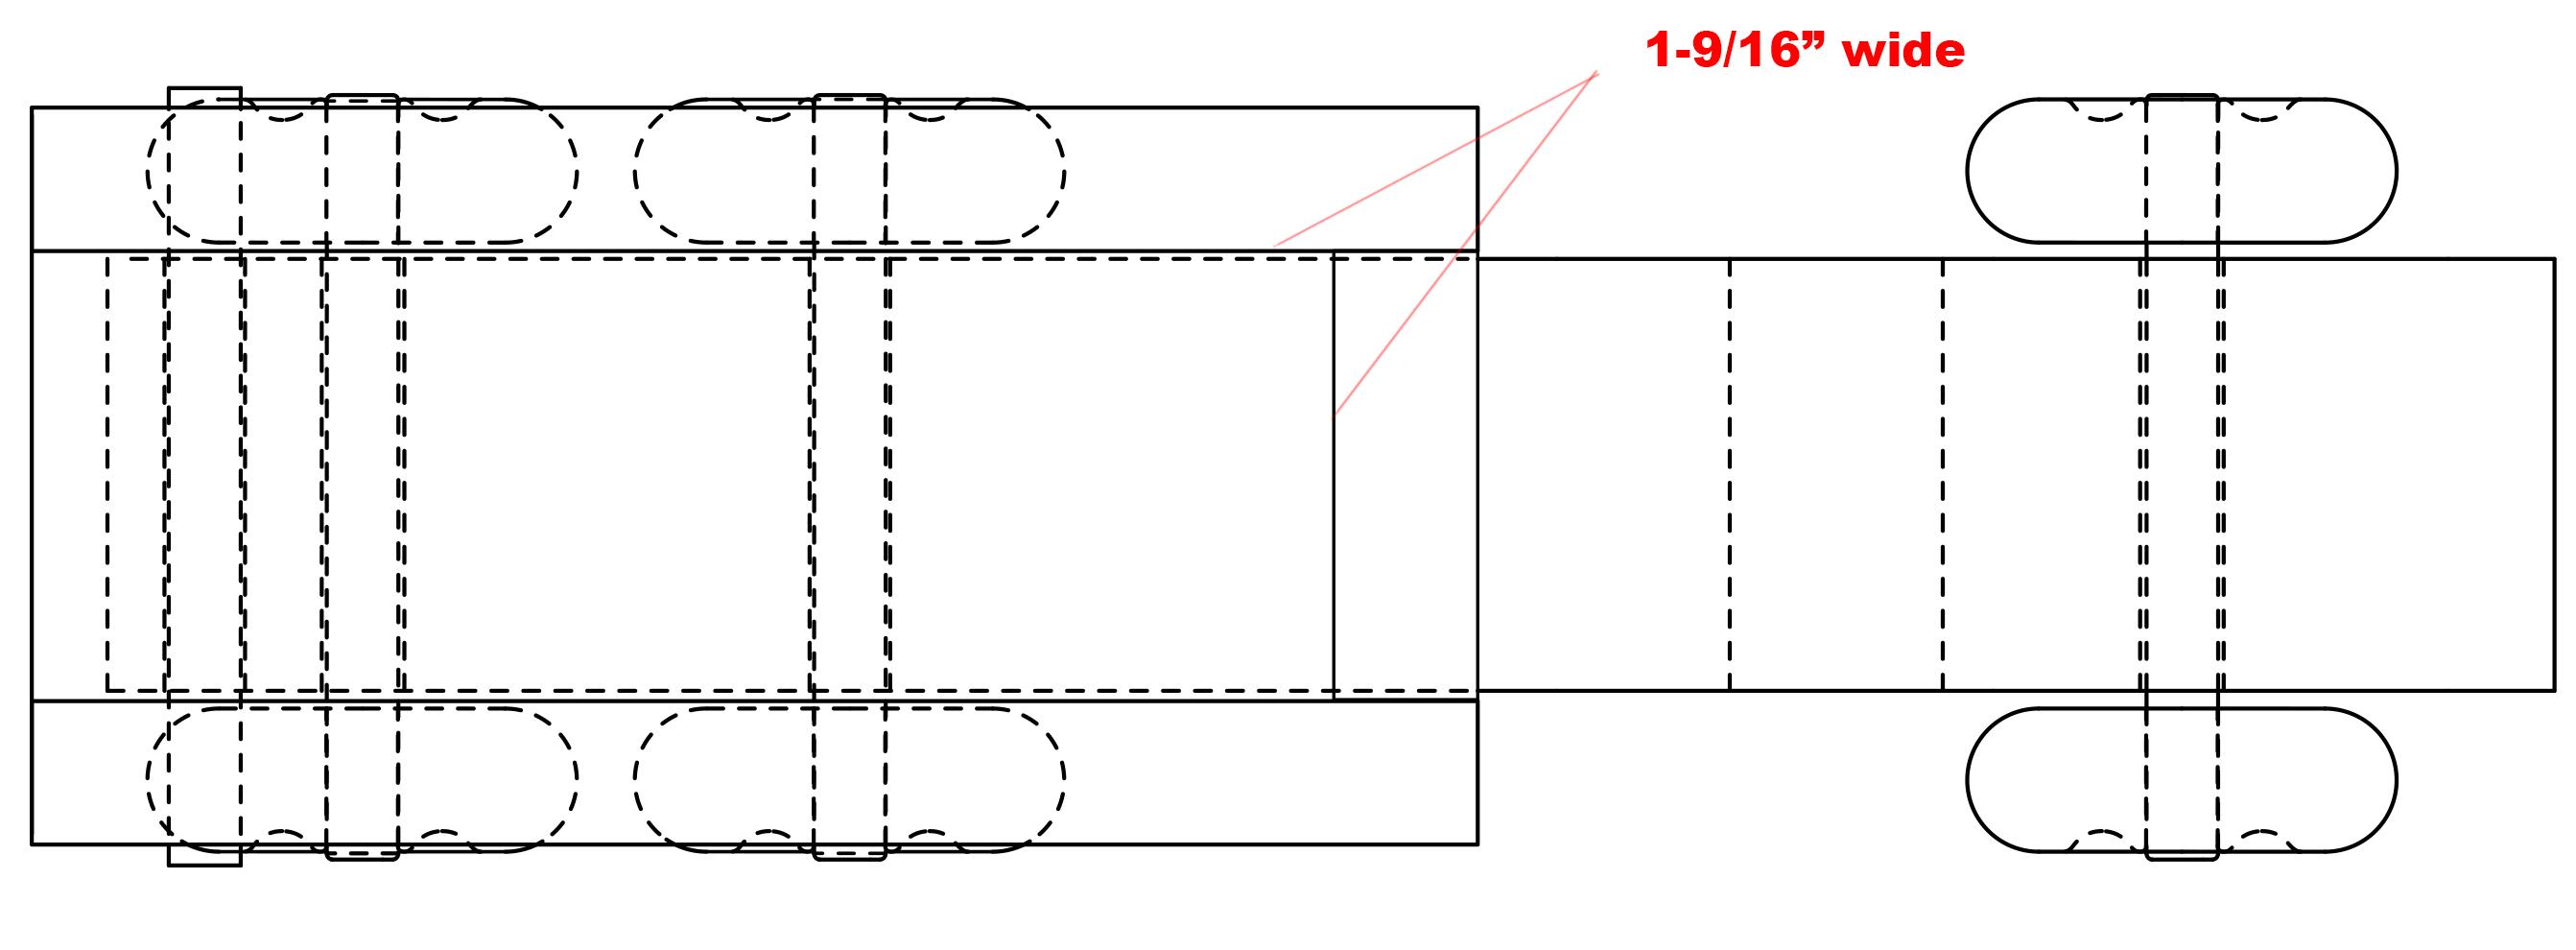 Pattern File 001-forum.jpg